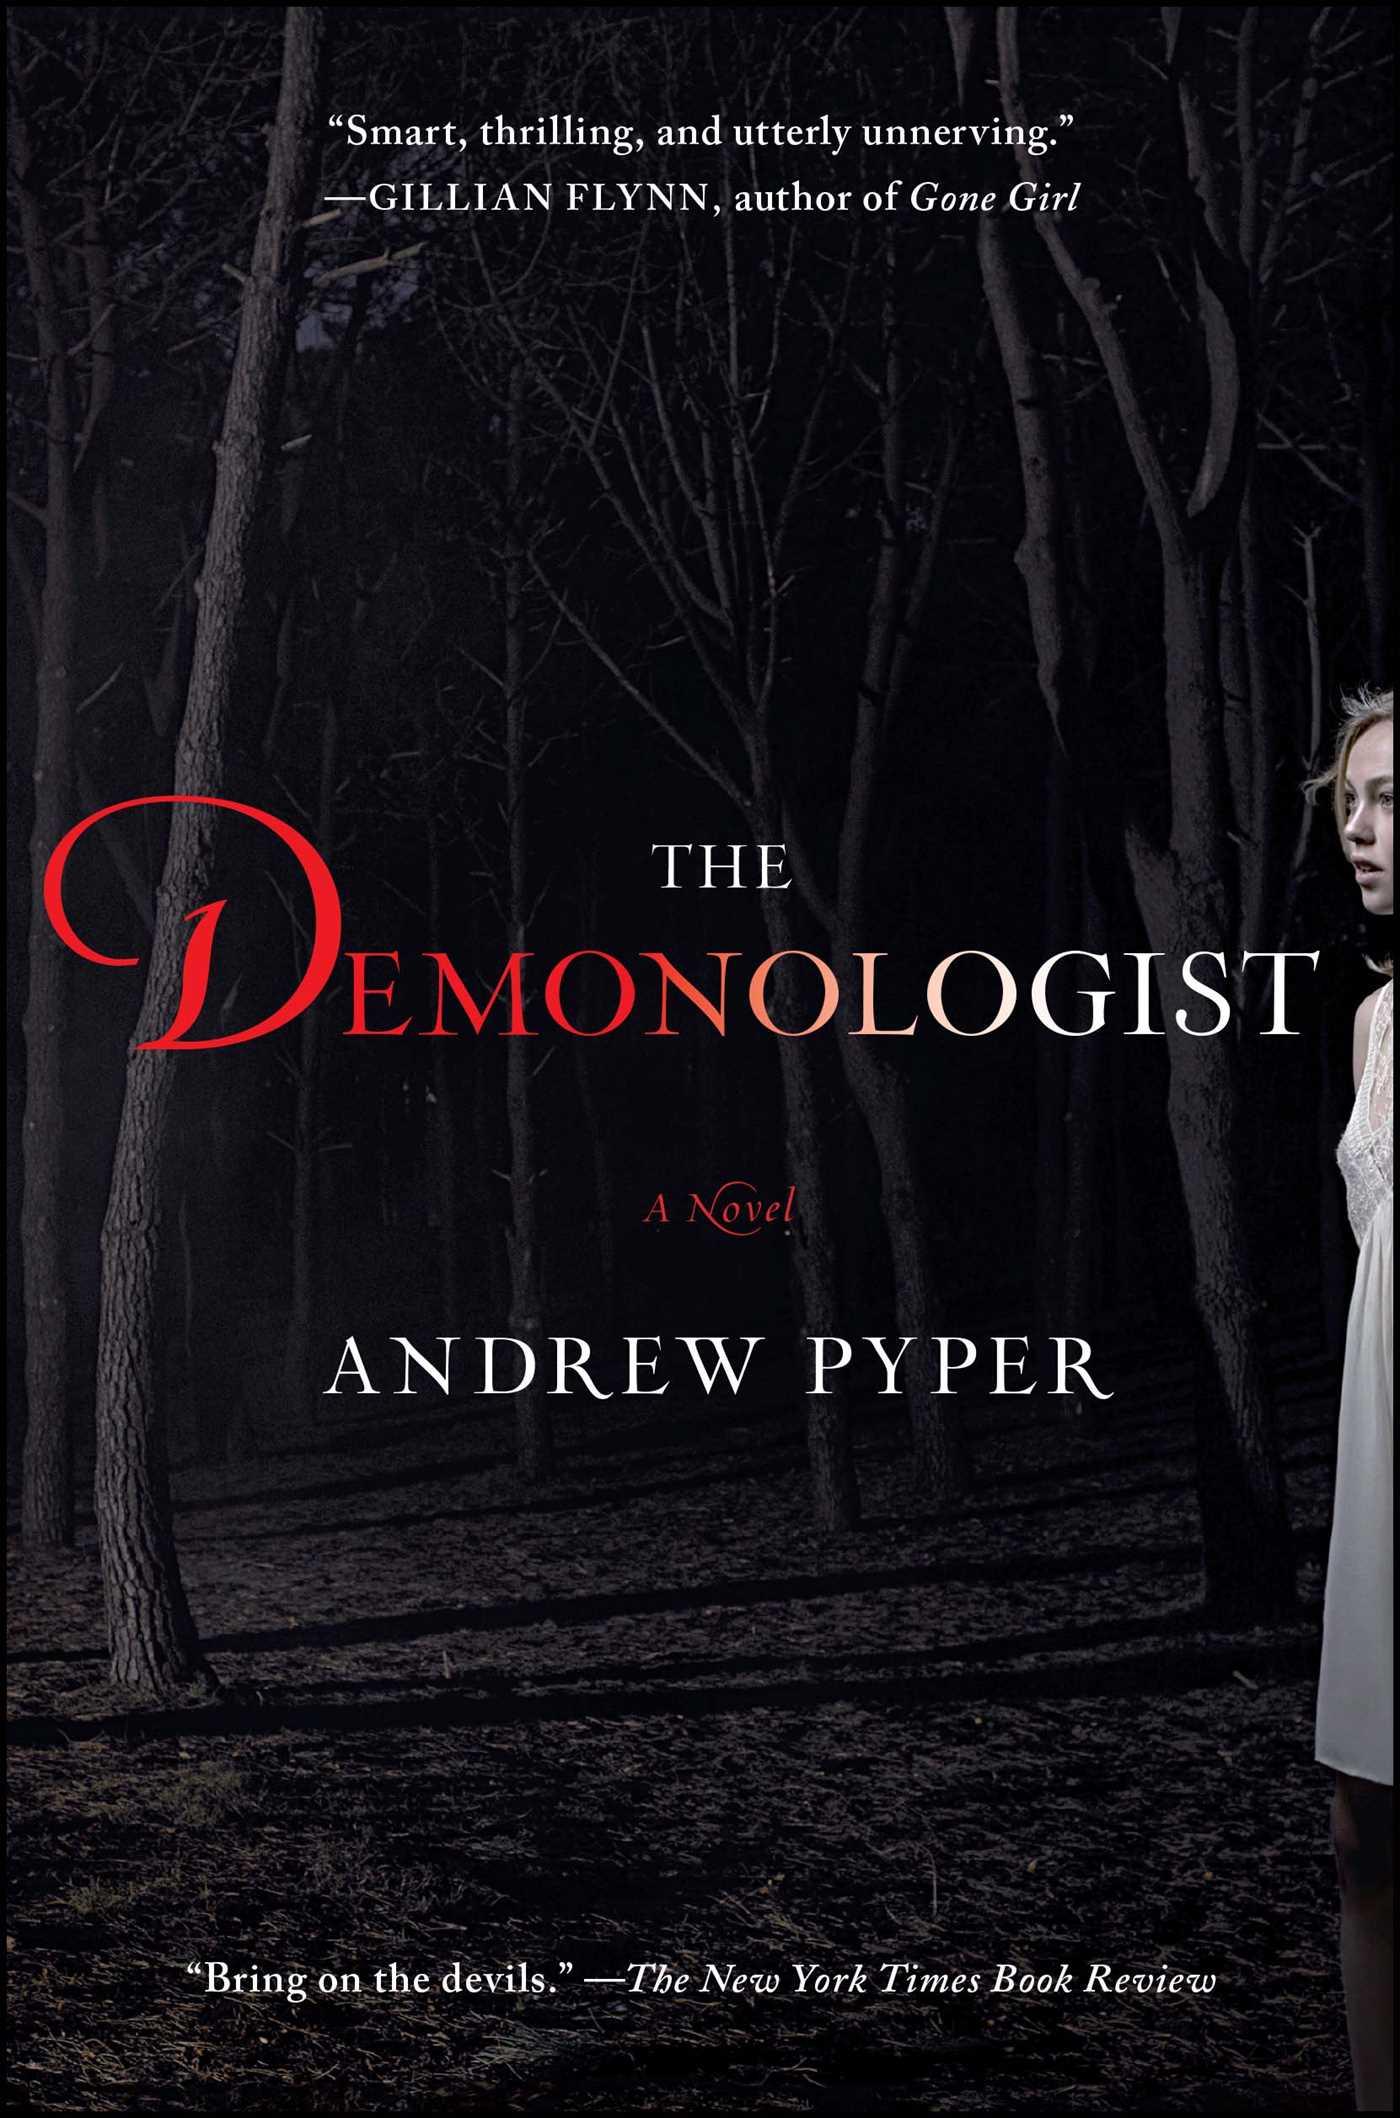 The demonologist 9781451697421 hr